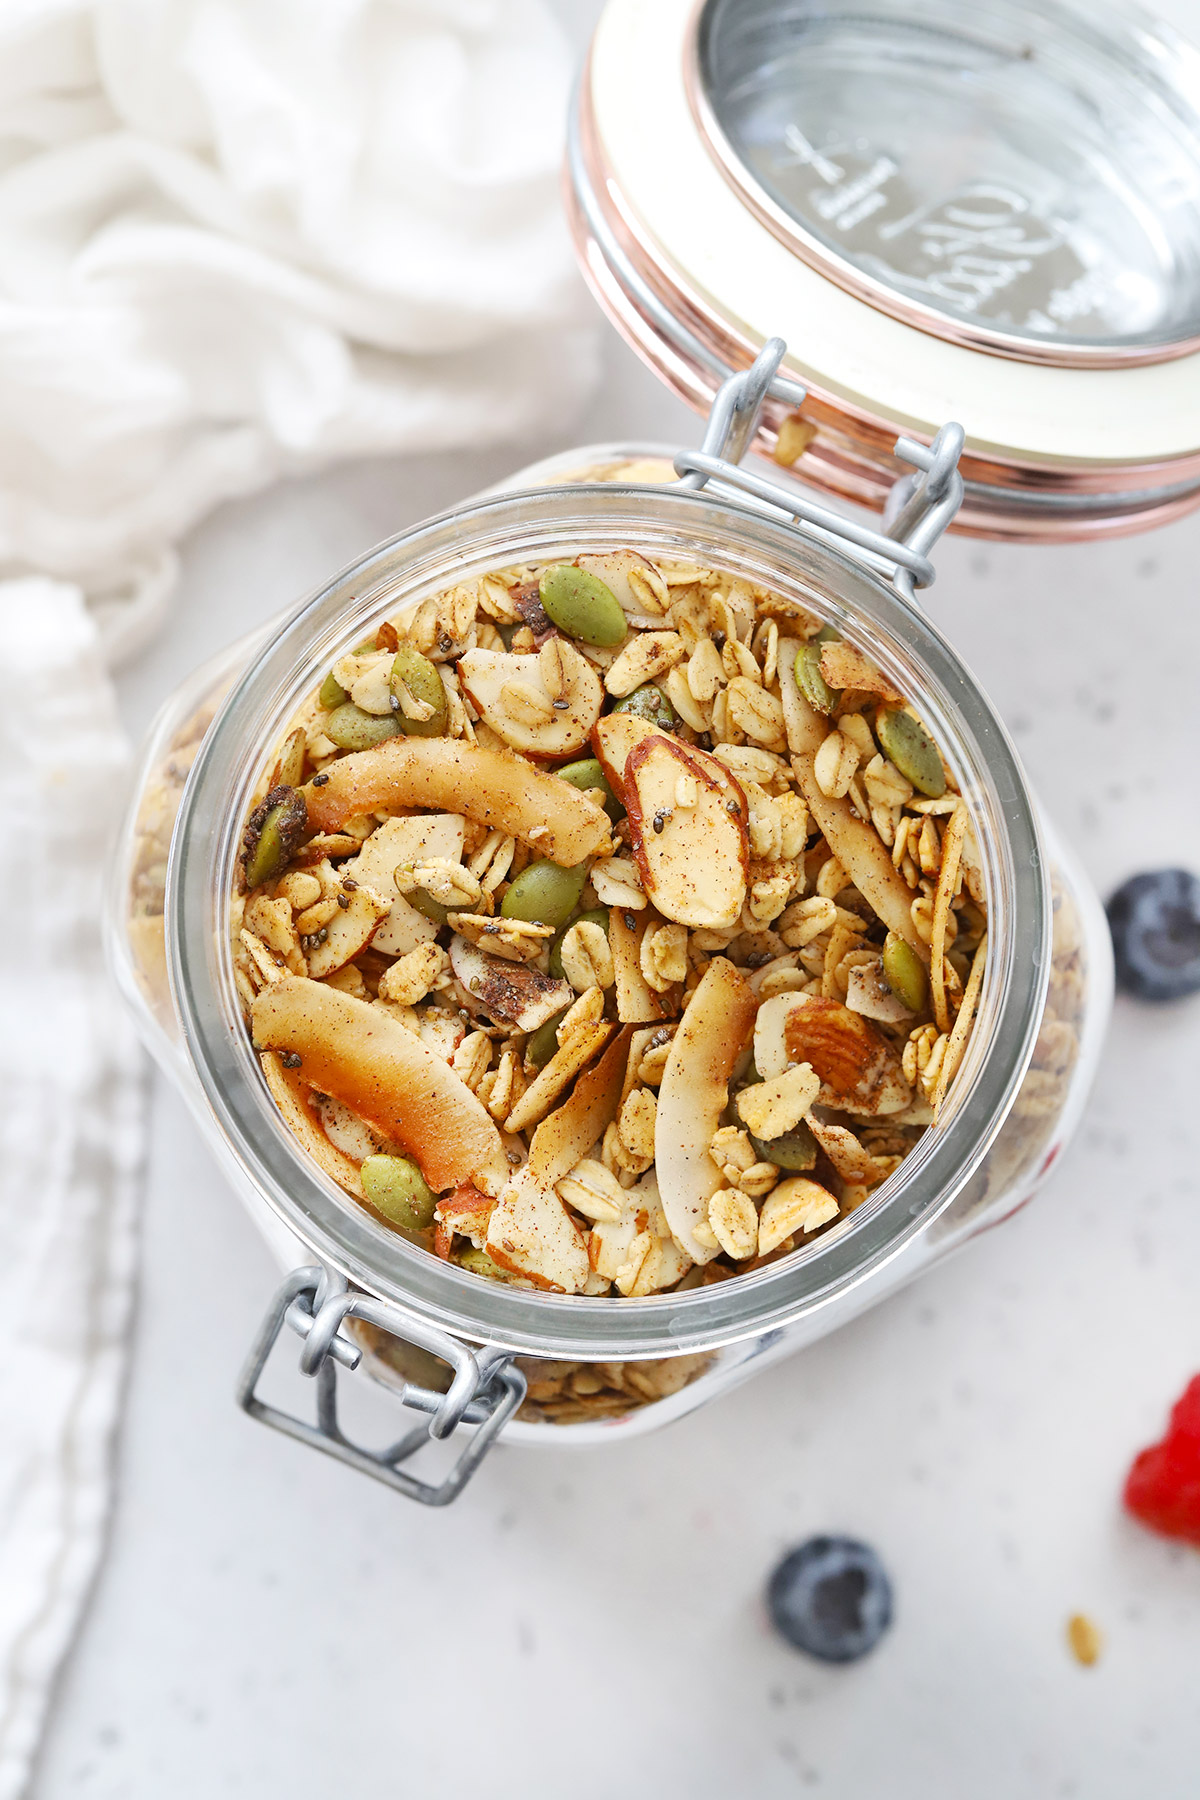 Overhead view of Jar of Gluten Free Warm Spiced Granola